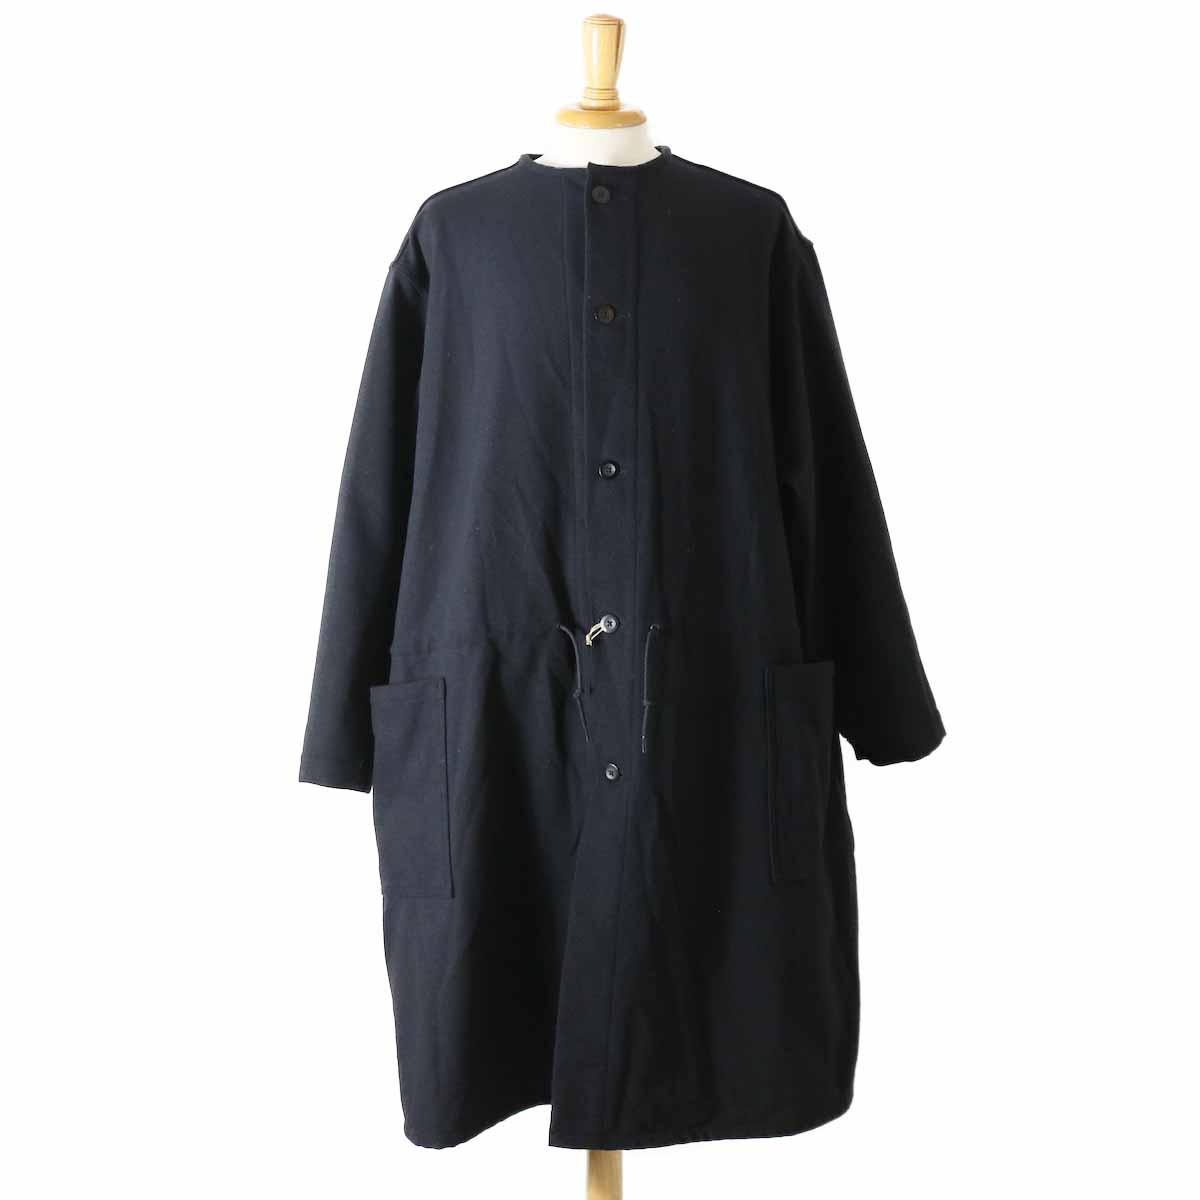 orSlow / Cotton Shell No Collar Coat -Melton Wool Herringbone Twill(BLACK)